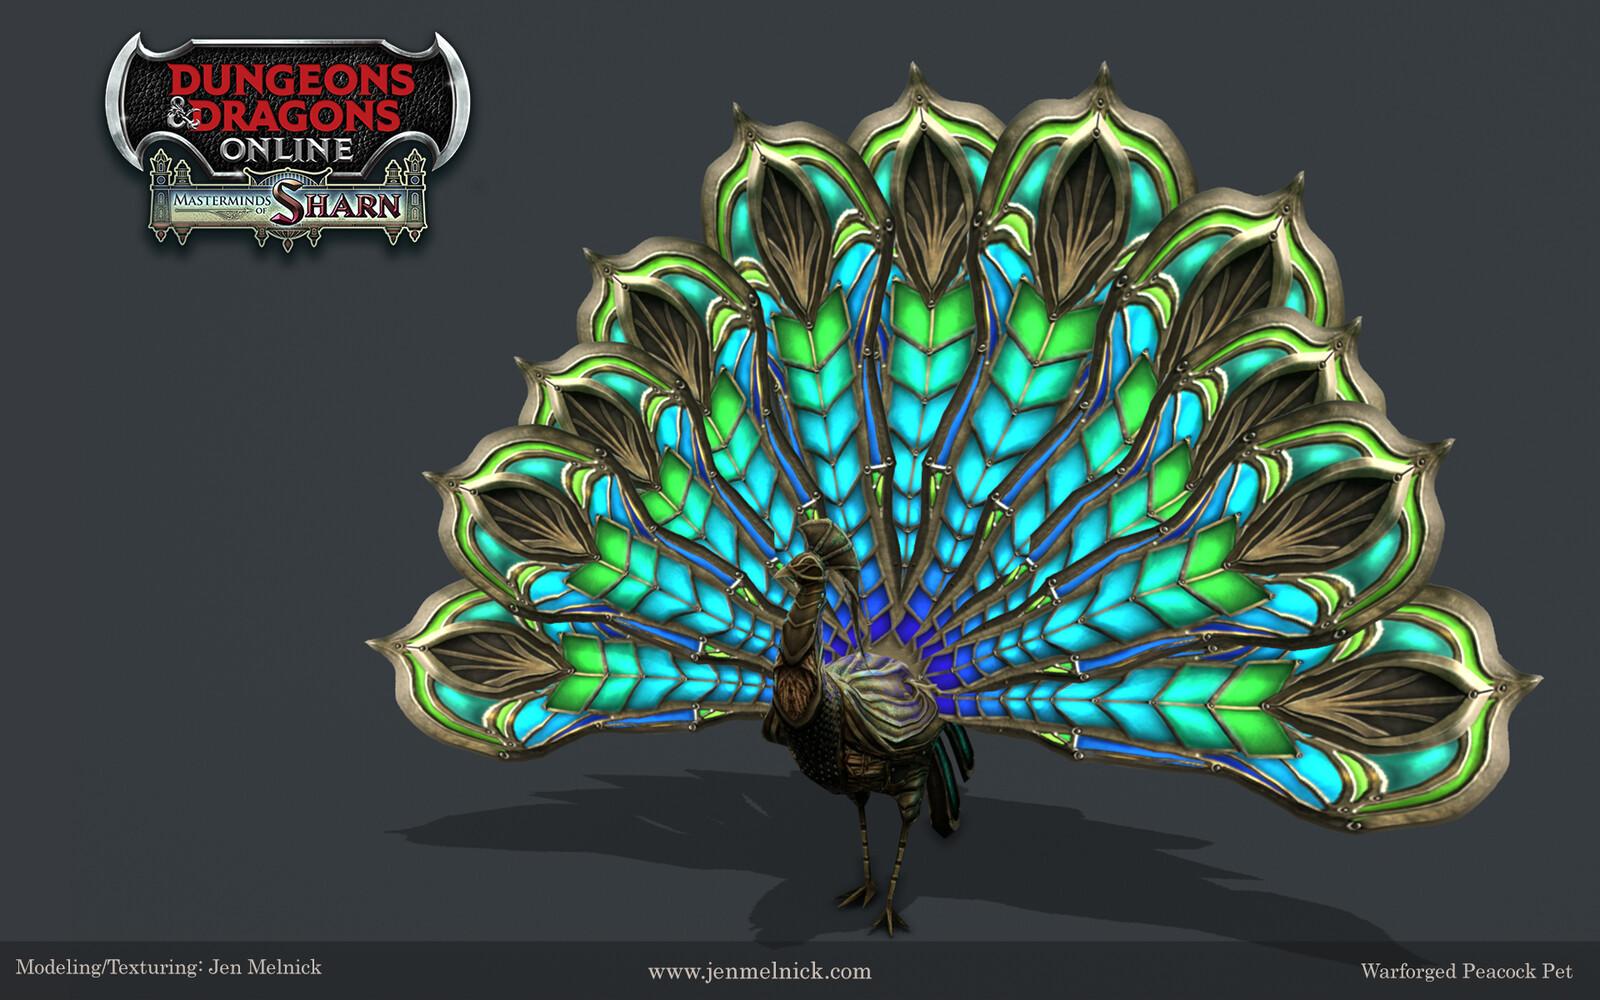 Warforged Peacock Pet Dungeons and Dragons Online Masterminds of Sharn Expansion  Ultimate Fan Bundle Pet Reward Marmoset Render